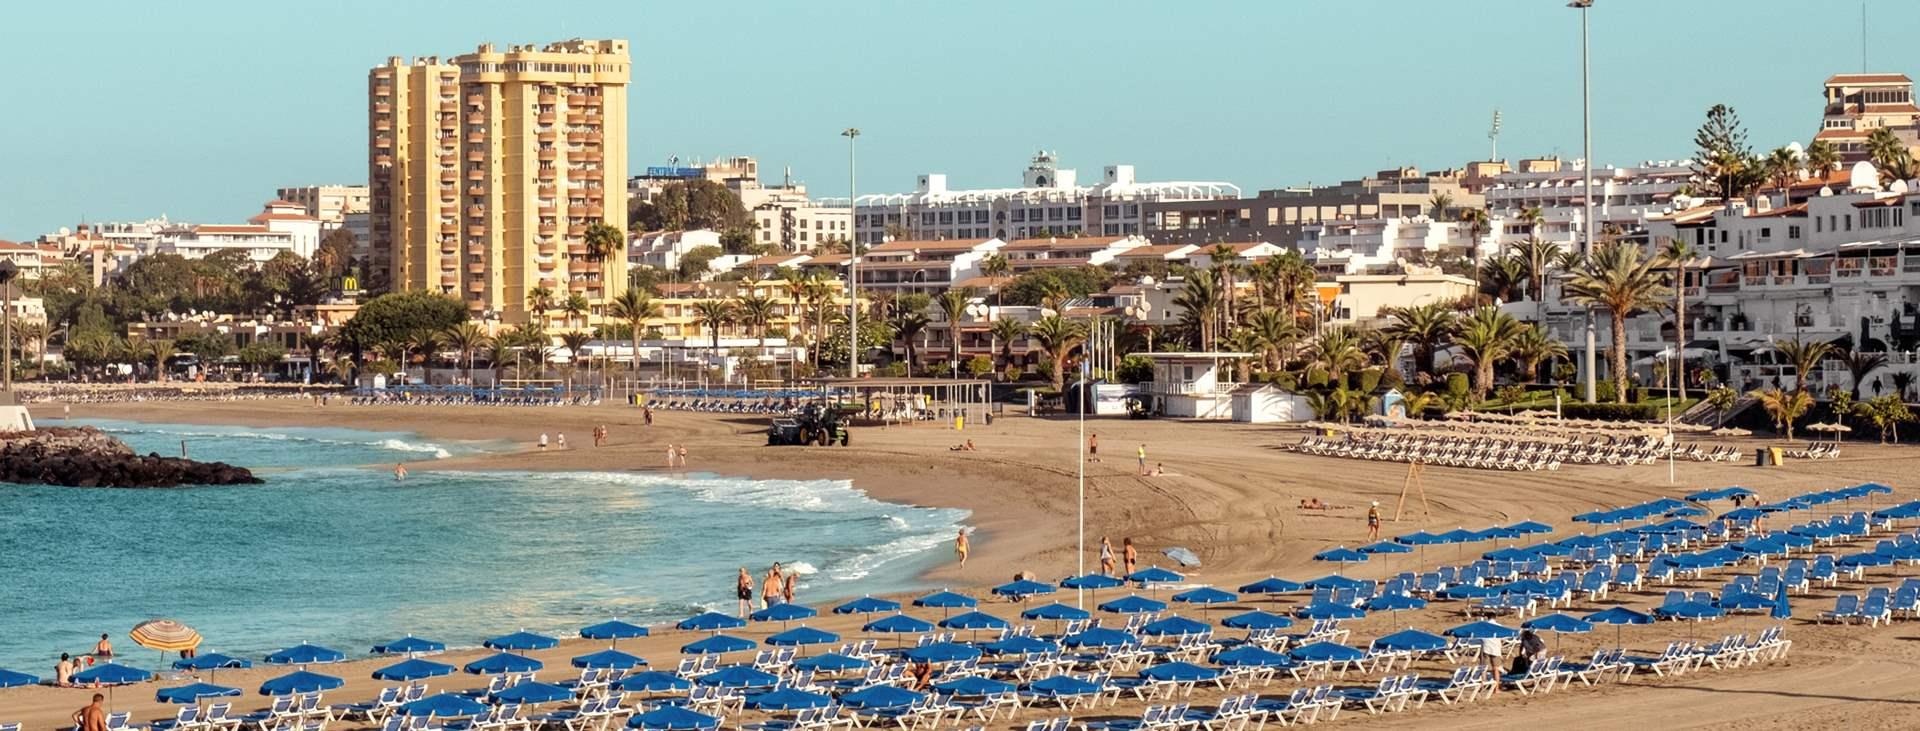 Bestill en reise til Playa de las Americas på Tenerife med Ving